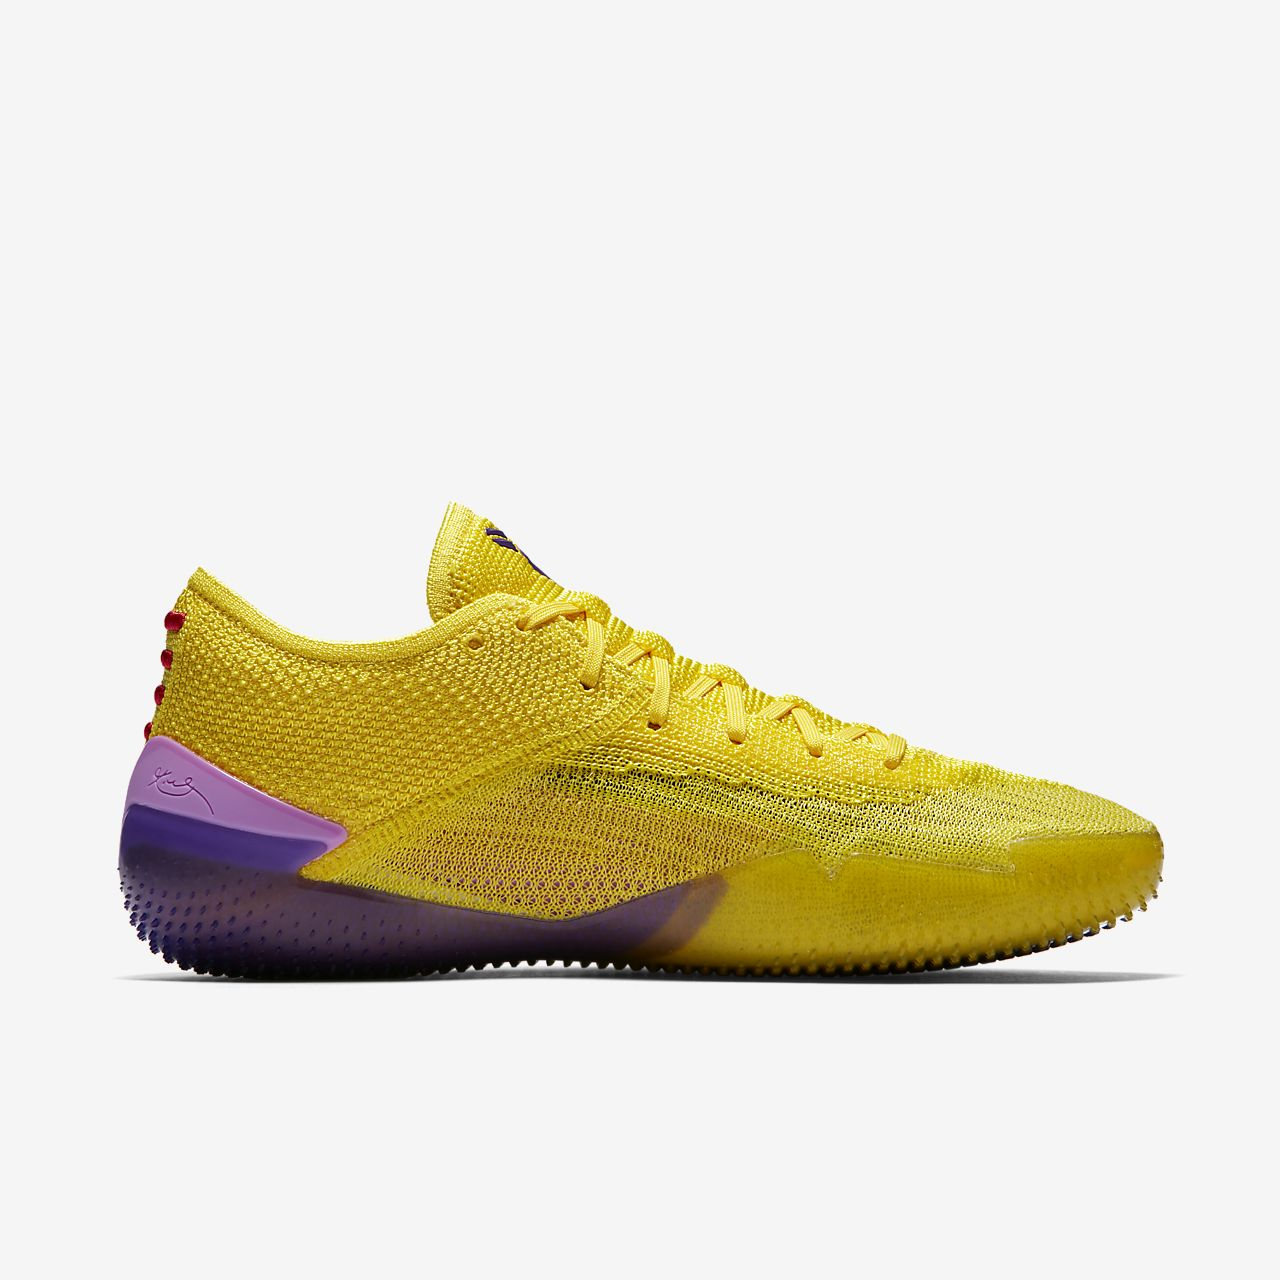 2c9917bc2760 Kobe A.D. NXT 360 Basketball Shoe. Nike.com GB